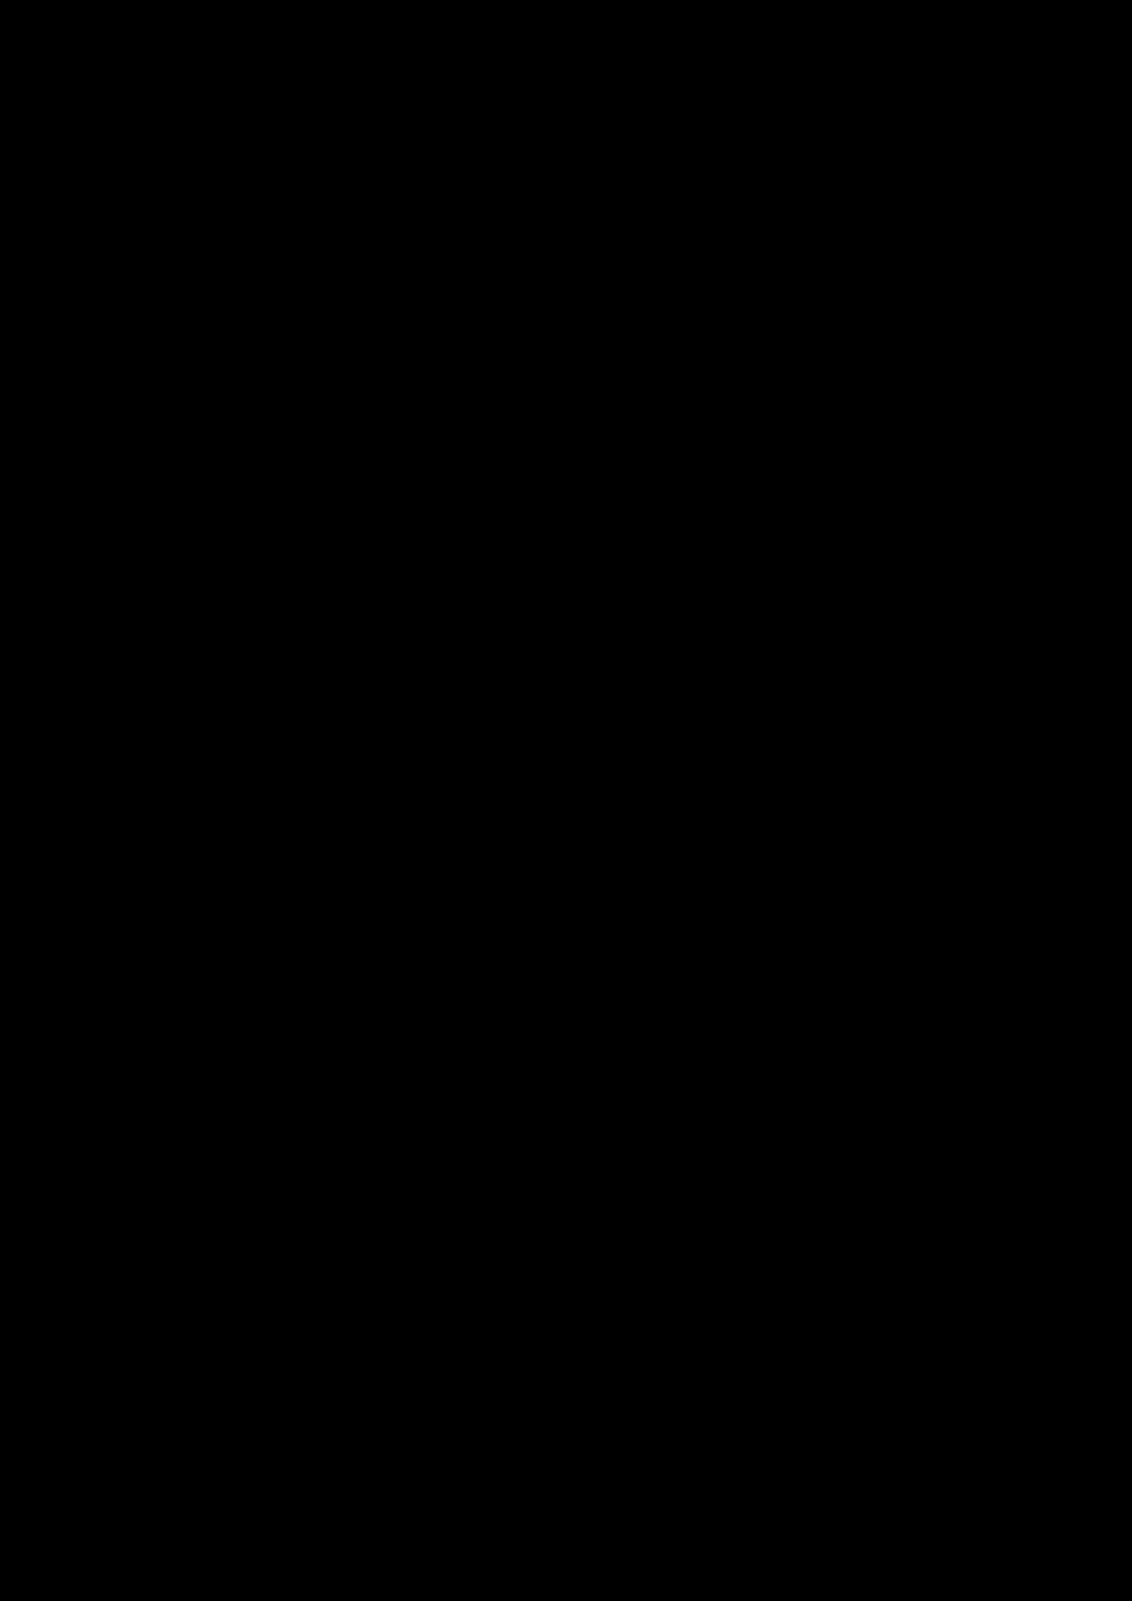 Belyiy sokol slide, Image 52